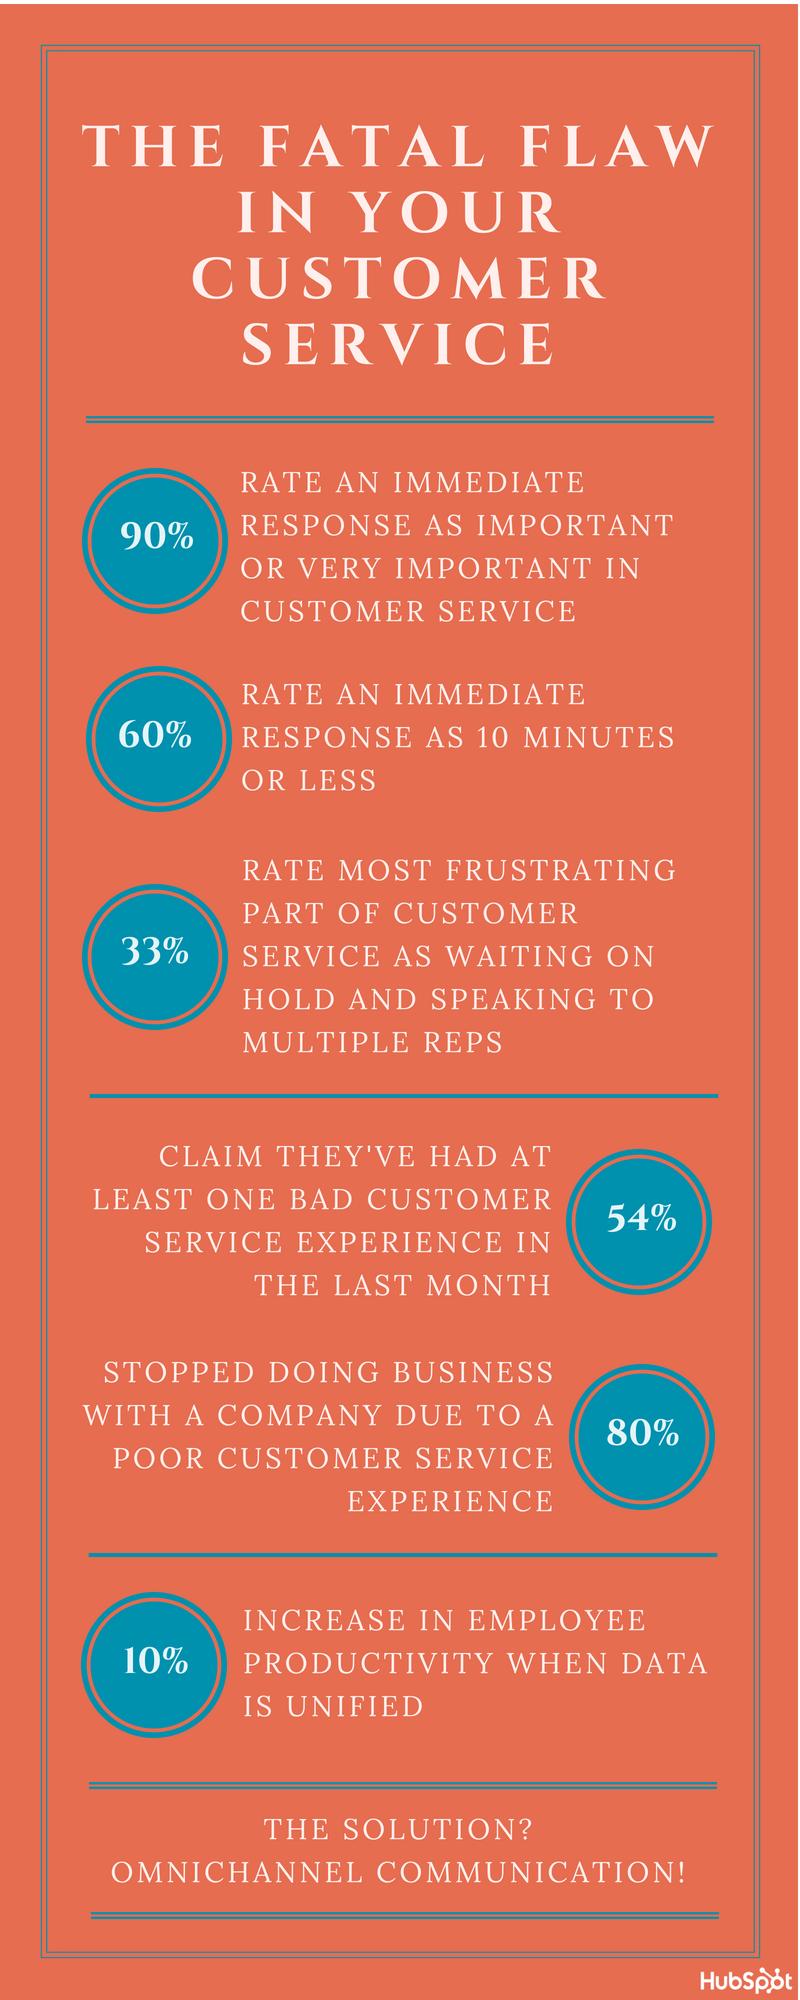 fatal-flaw-customer-service1-1